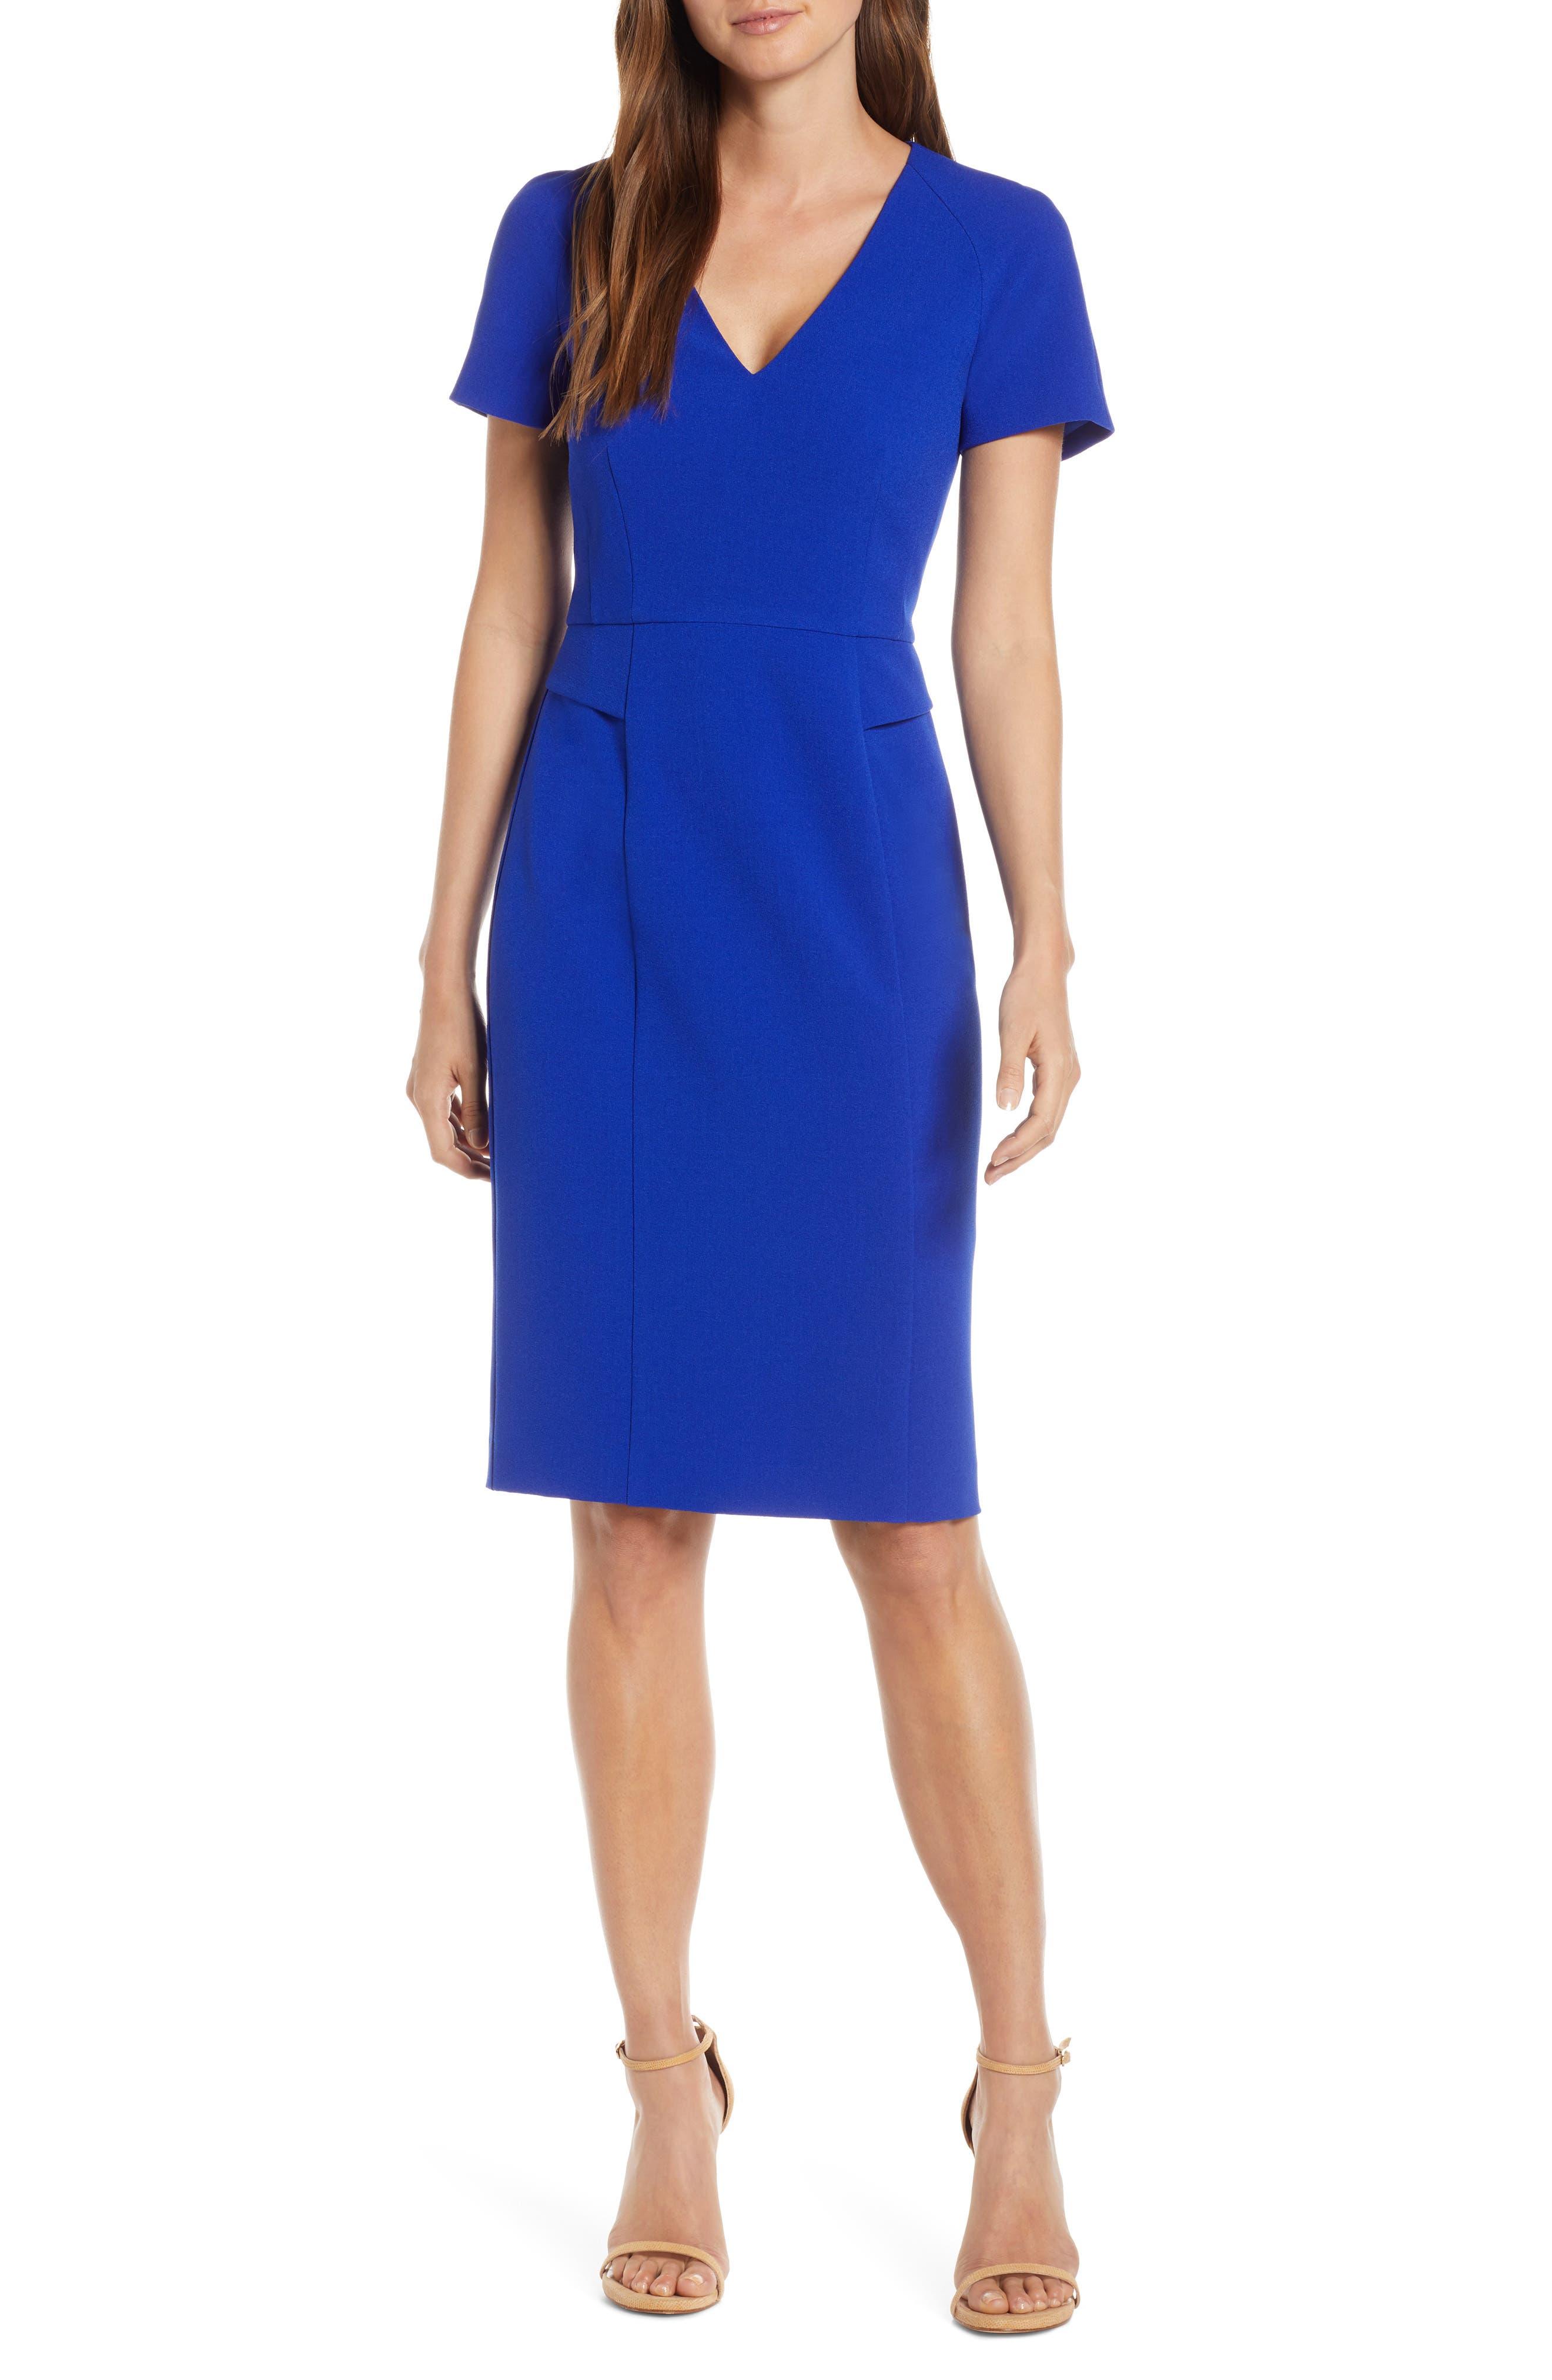 Harper Rose Short Sleeve V-Neck Sheath Dress, Blue